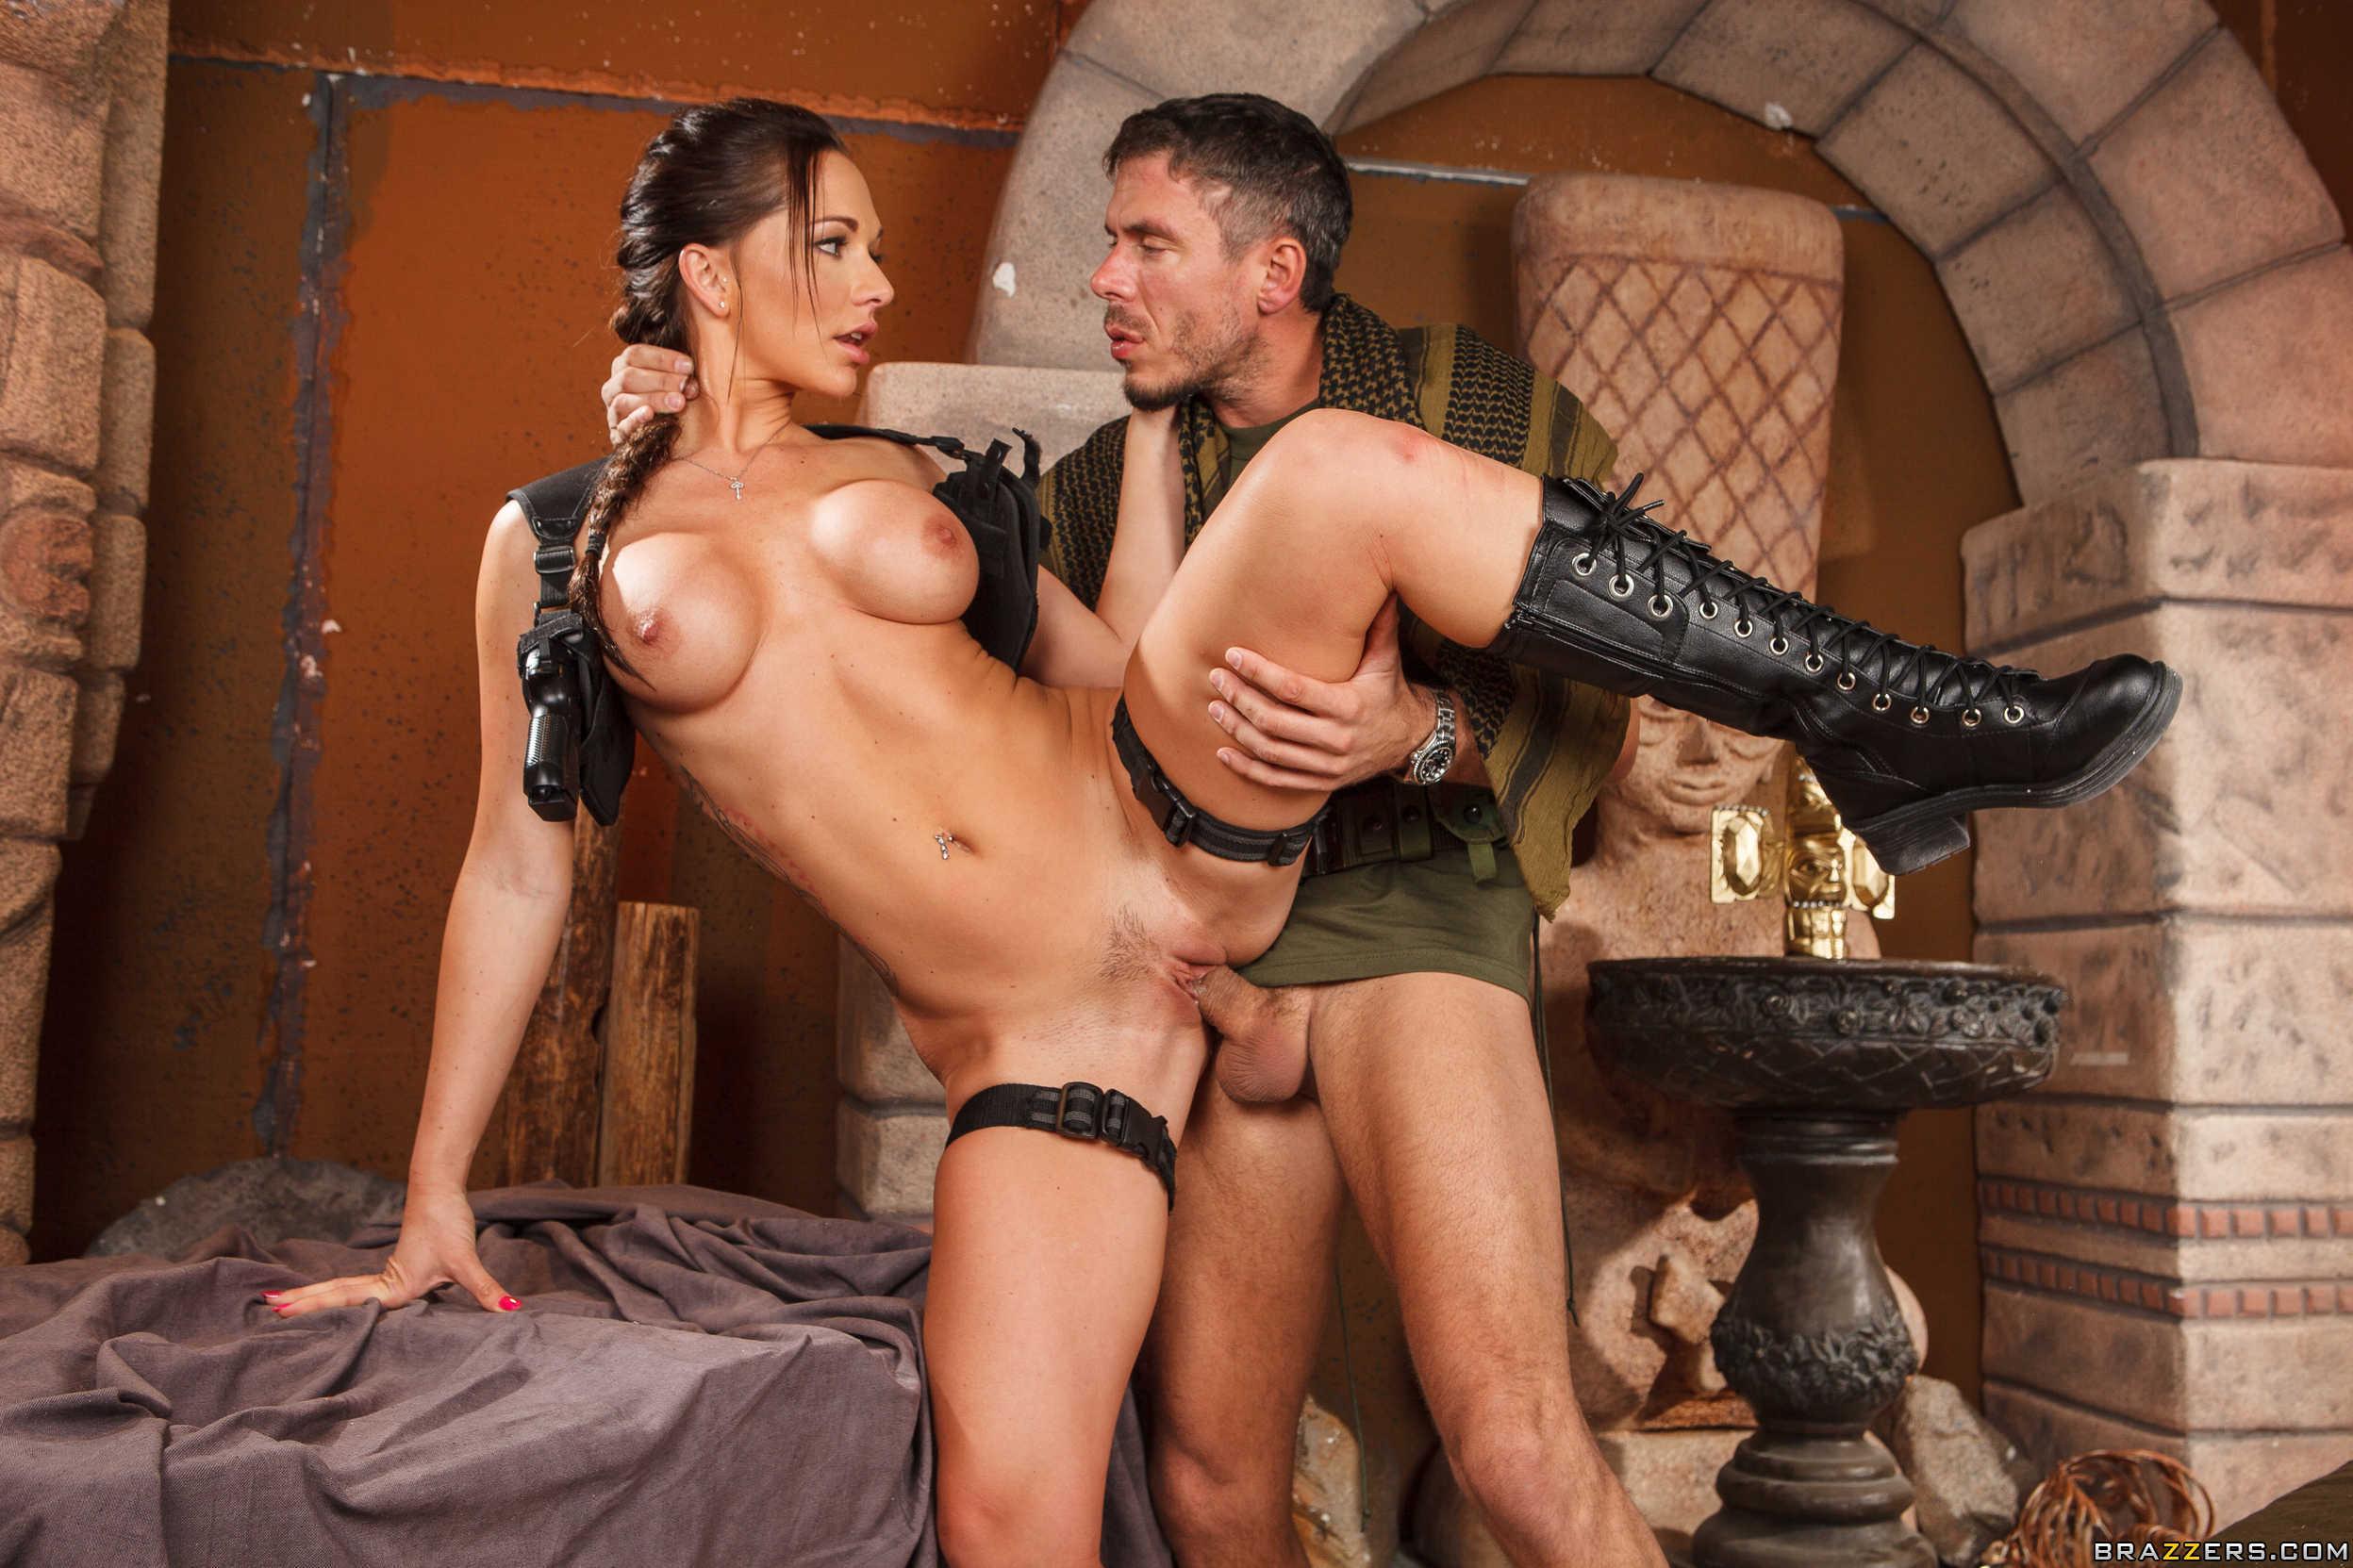 Порно ролики дюжина райдер — pic 11